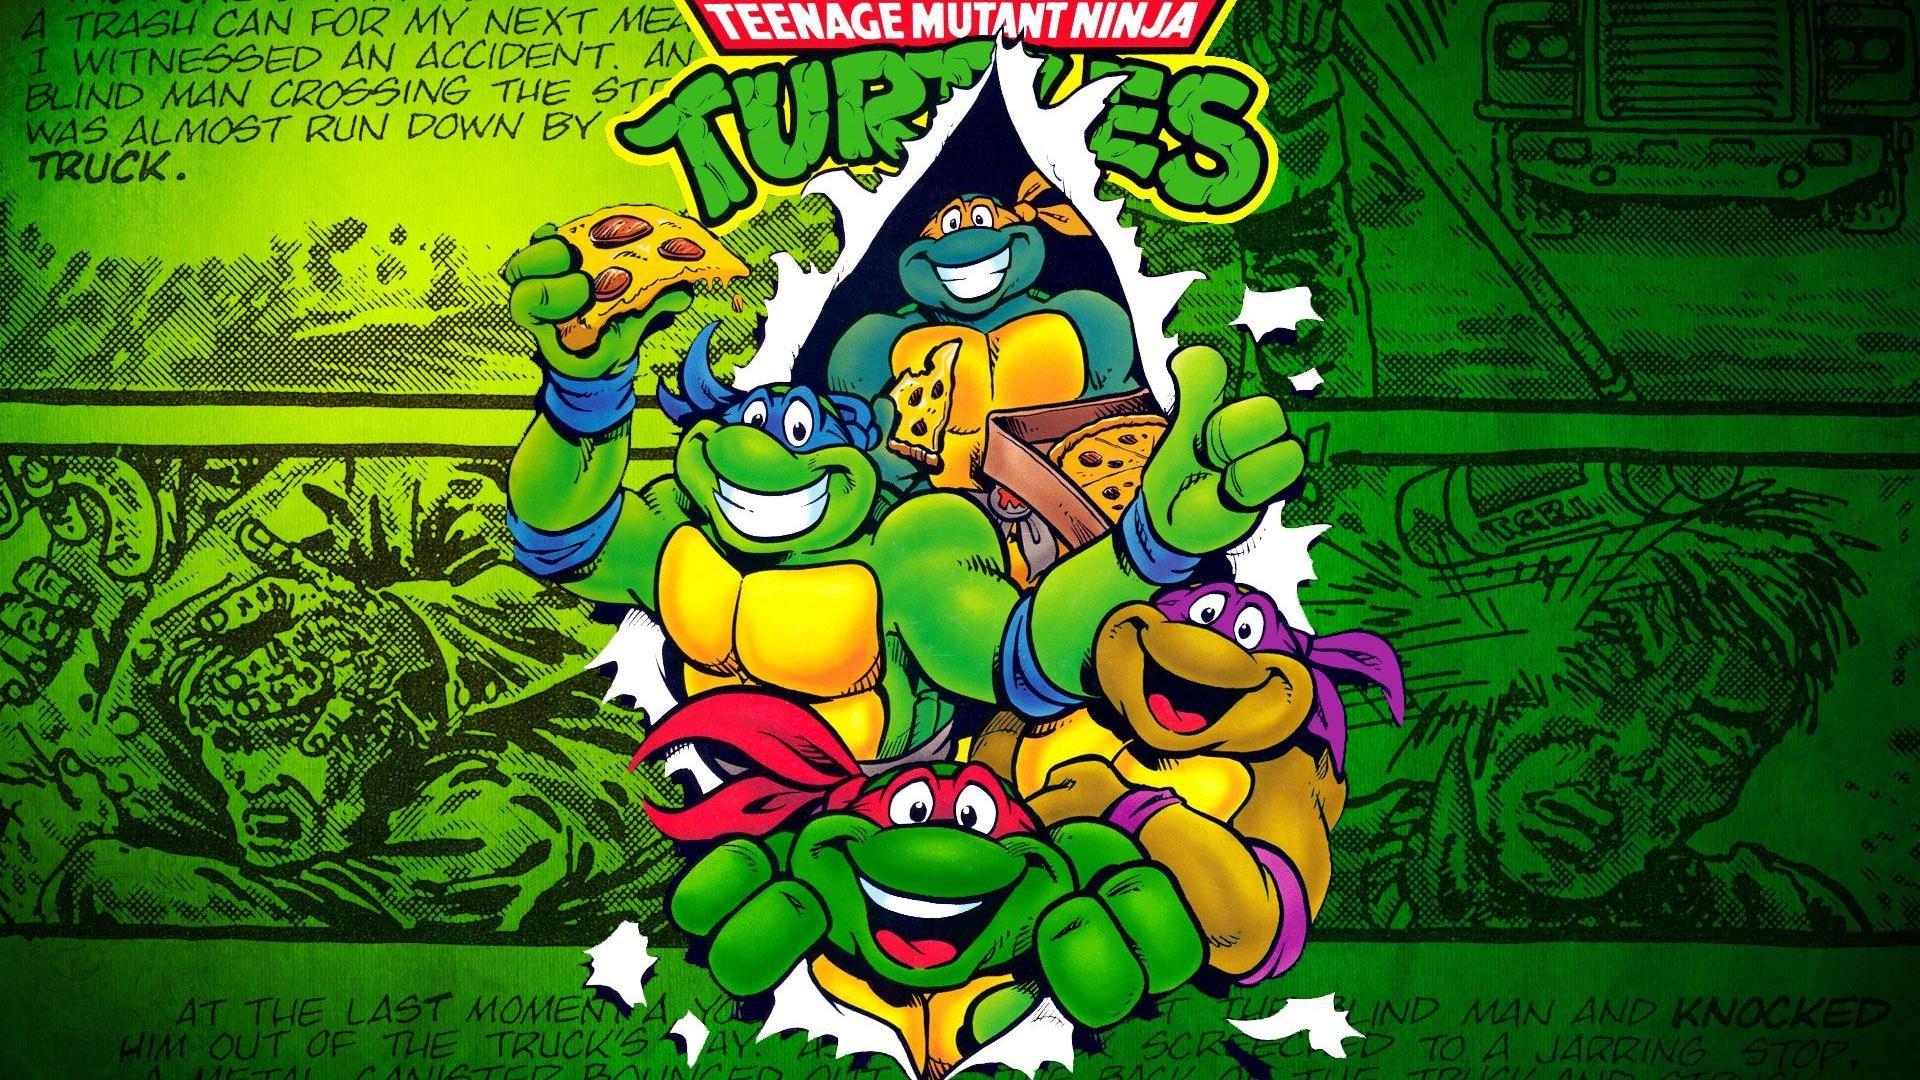 mutant ninja turtles 1080×1920 Wallpaper, HDTV Desktop Wallpaper .